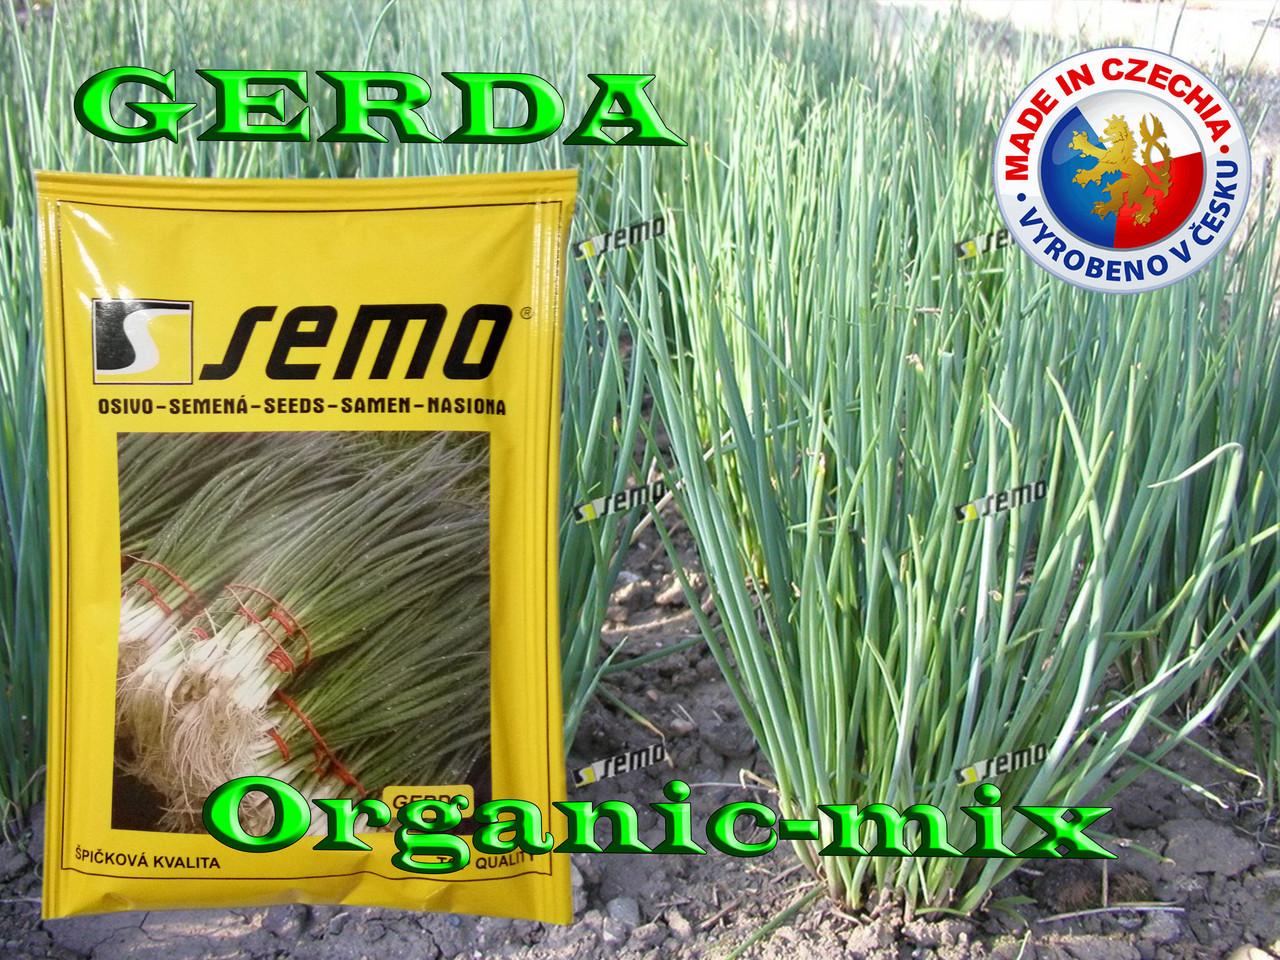 Лук на перо (на зелень) ГЕРДА / GERDA, ТМ SEMO (Чехия), проф. пакет 500 грамм